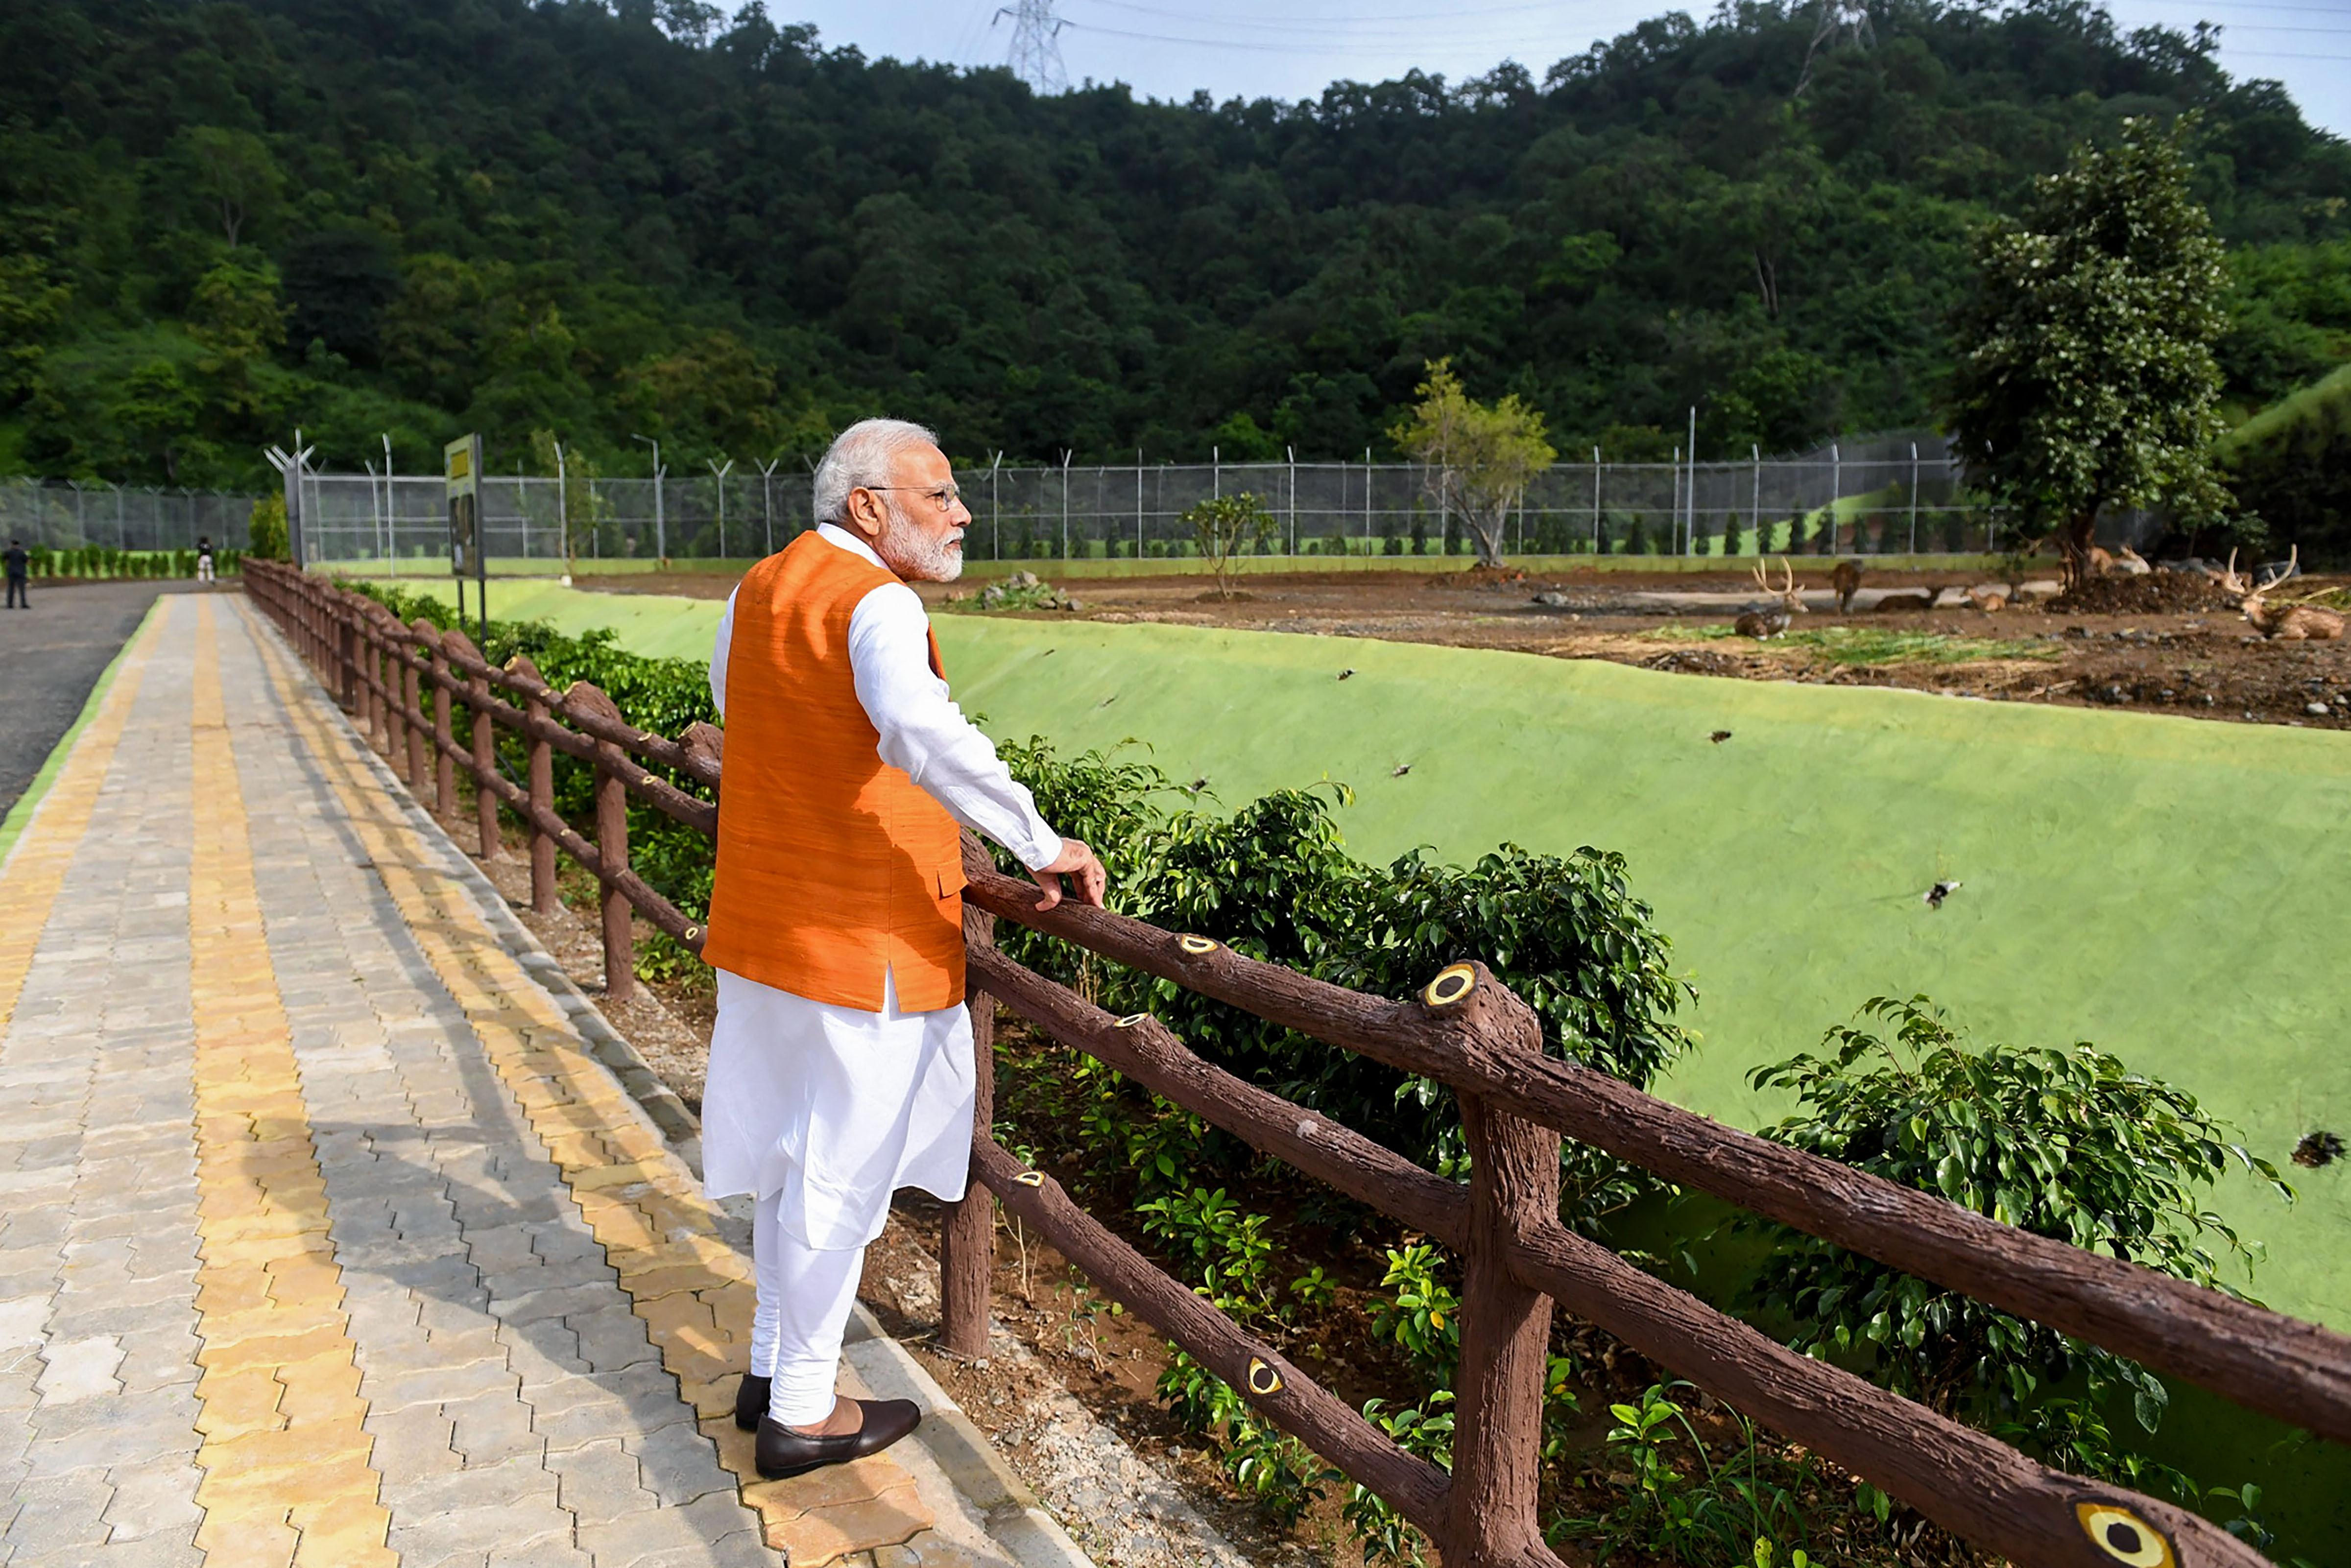 Prime Minister Narendra Modi at a river rafting facility on his 69th birthday in Kevadia, Gujarat, on September 17.